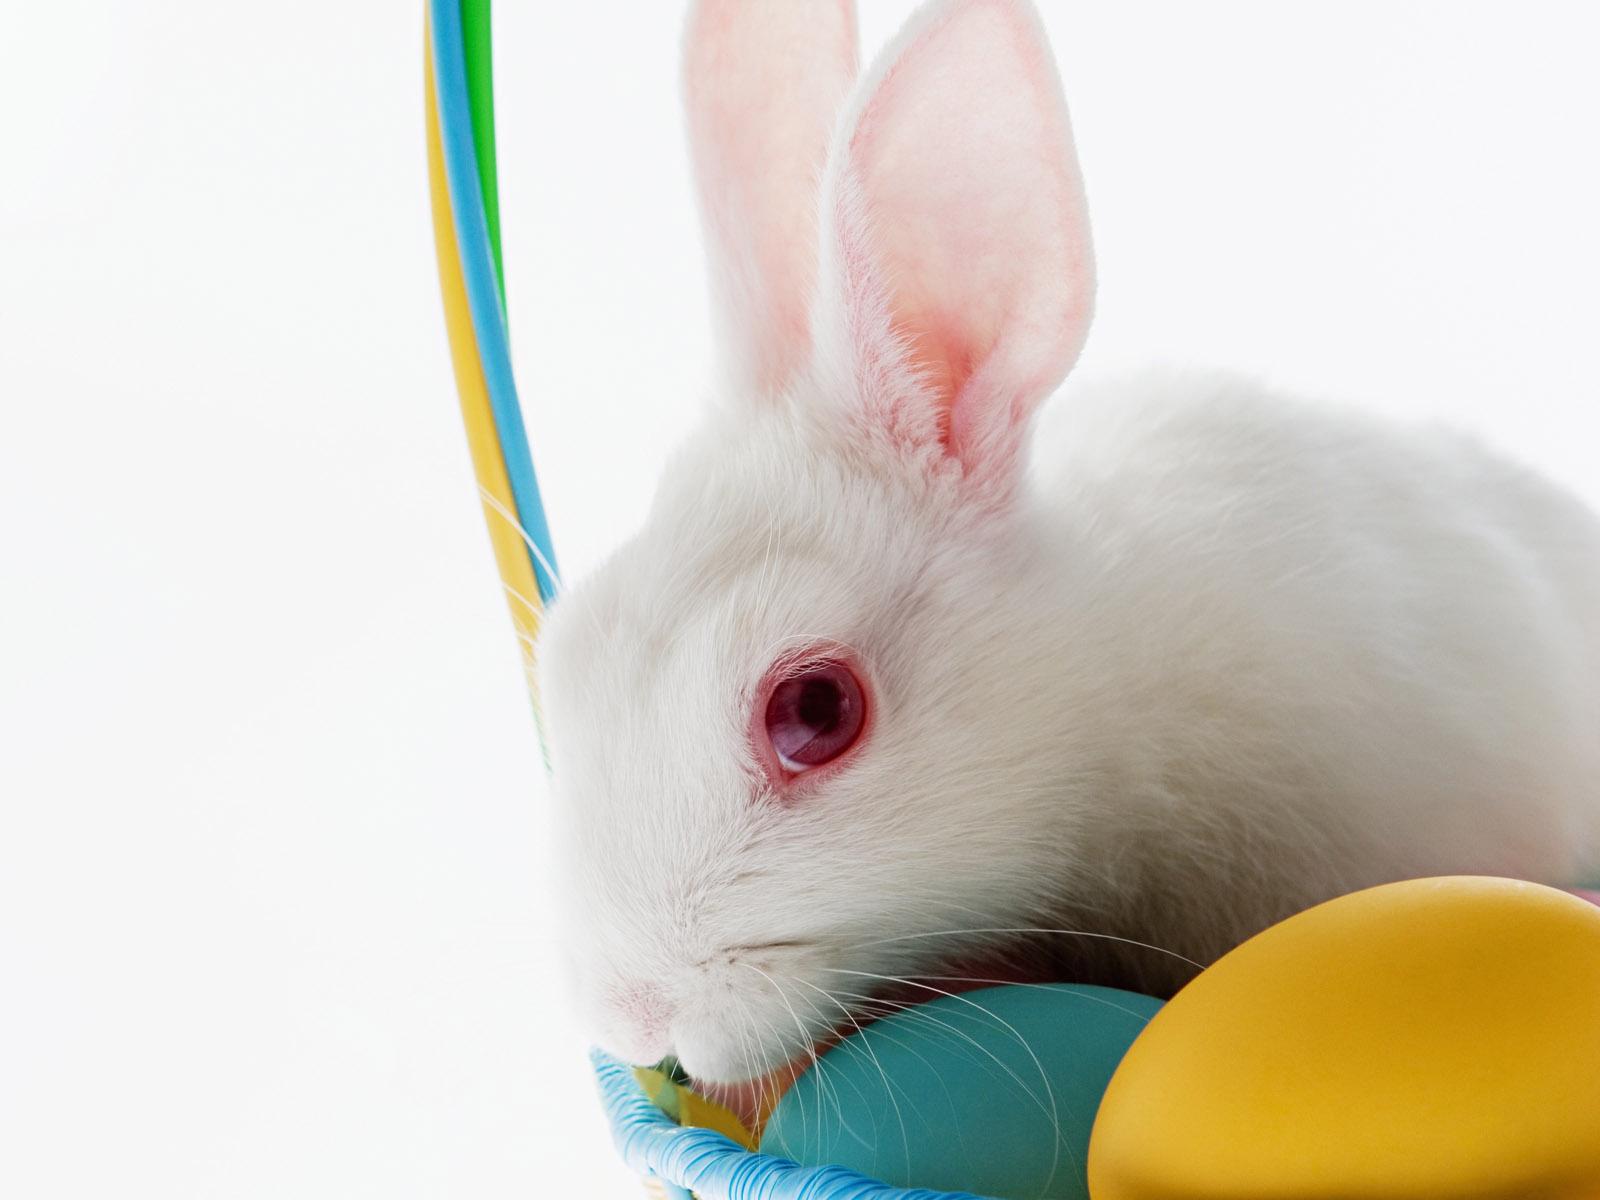 Cute Bunny Rabbit Easter Wallpapers for Desktop Christian 1600x1200